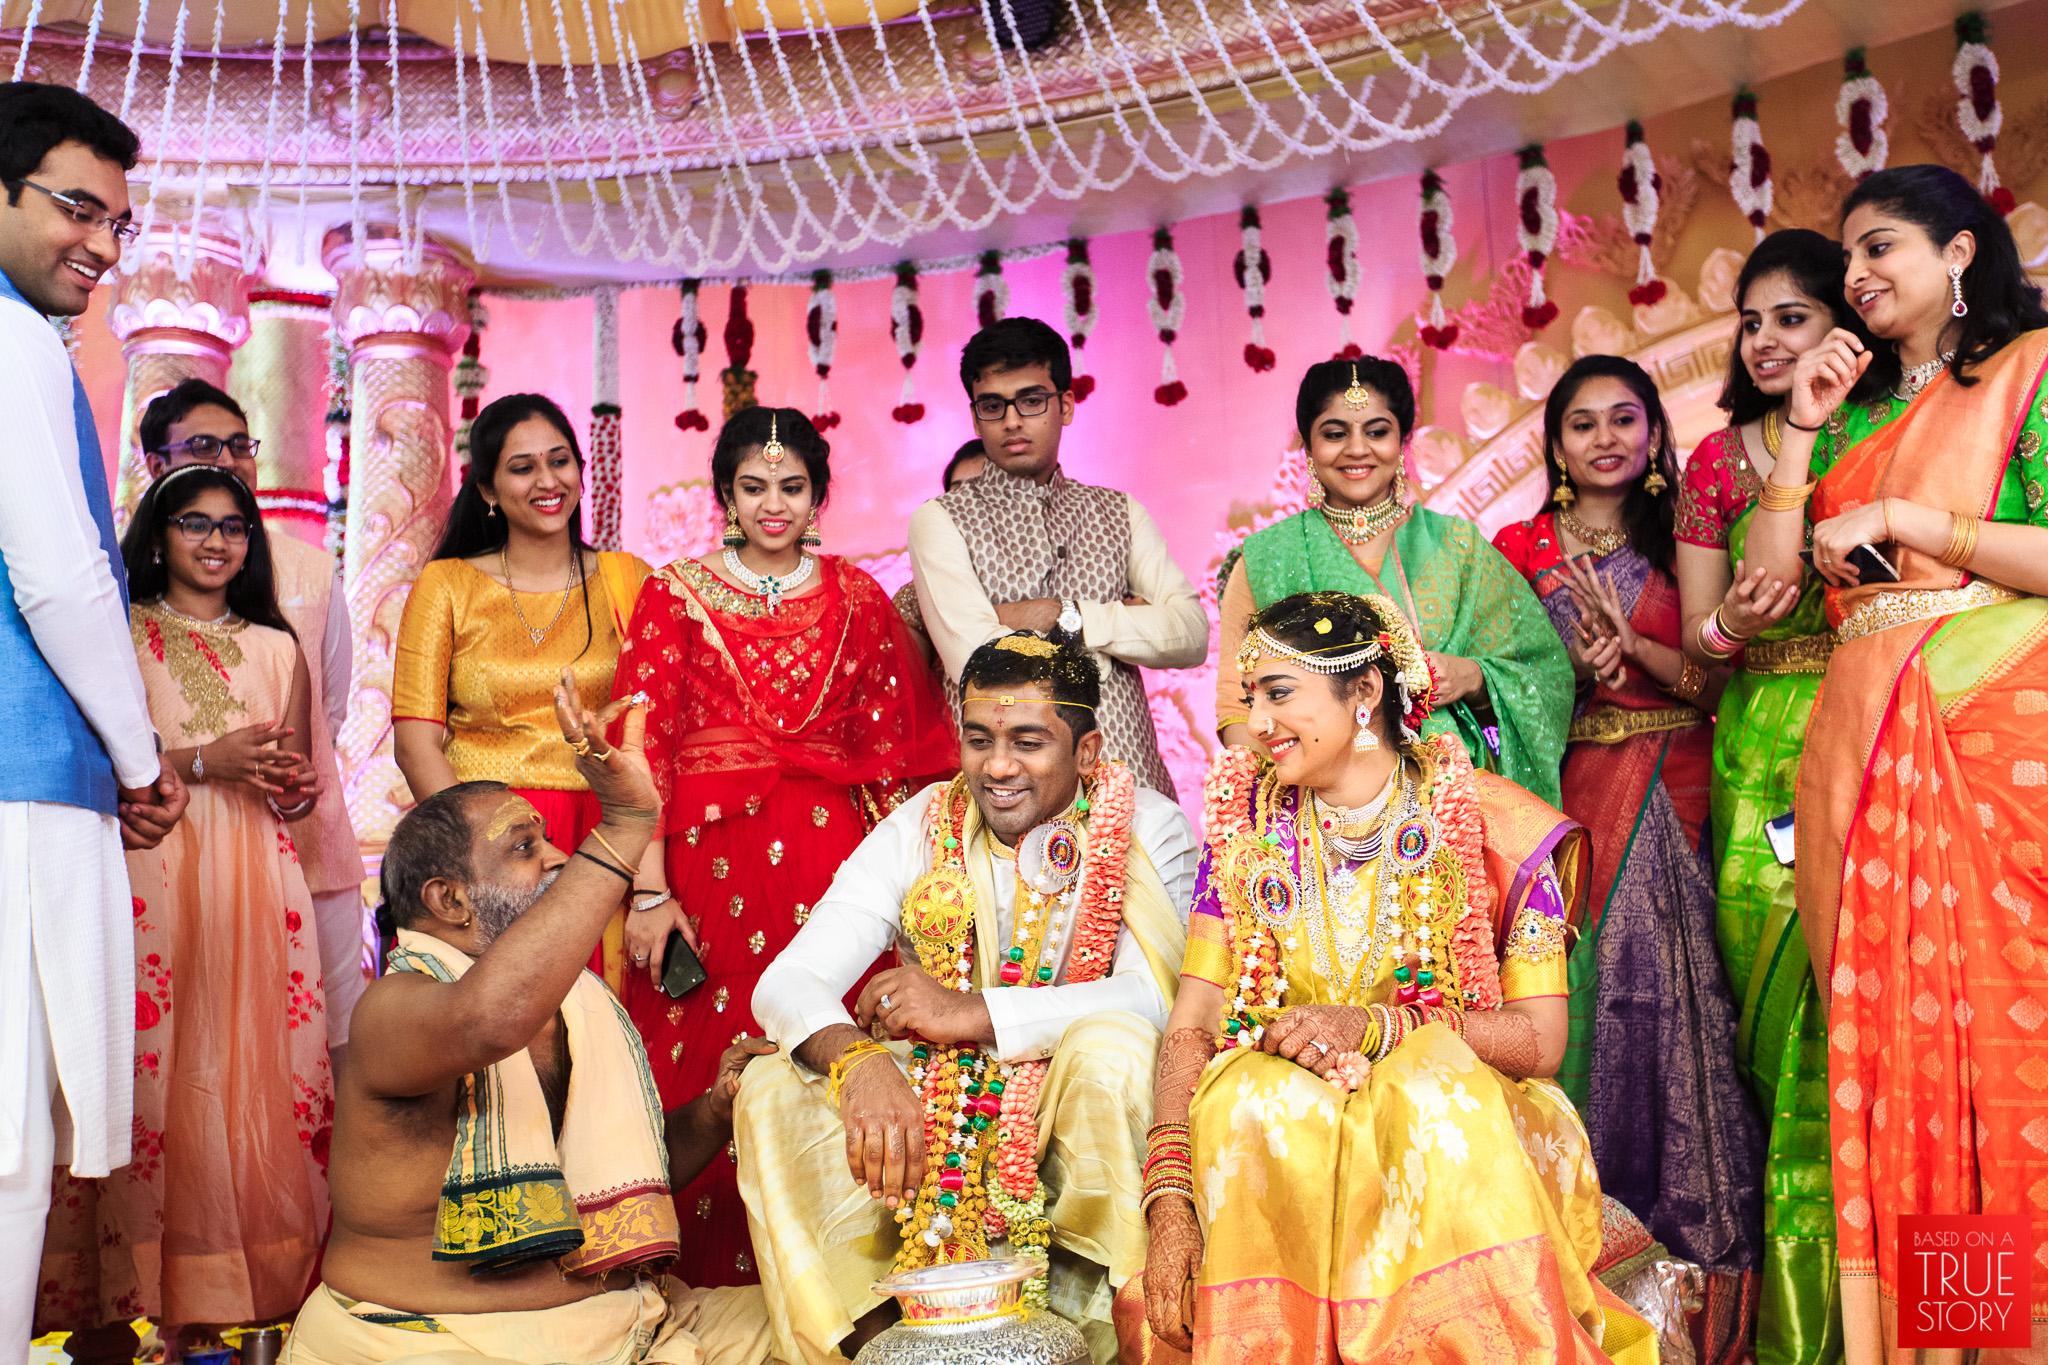 Candid-Wedding-Photography-Hyderabad-0087.jpg